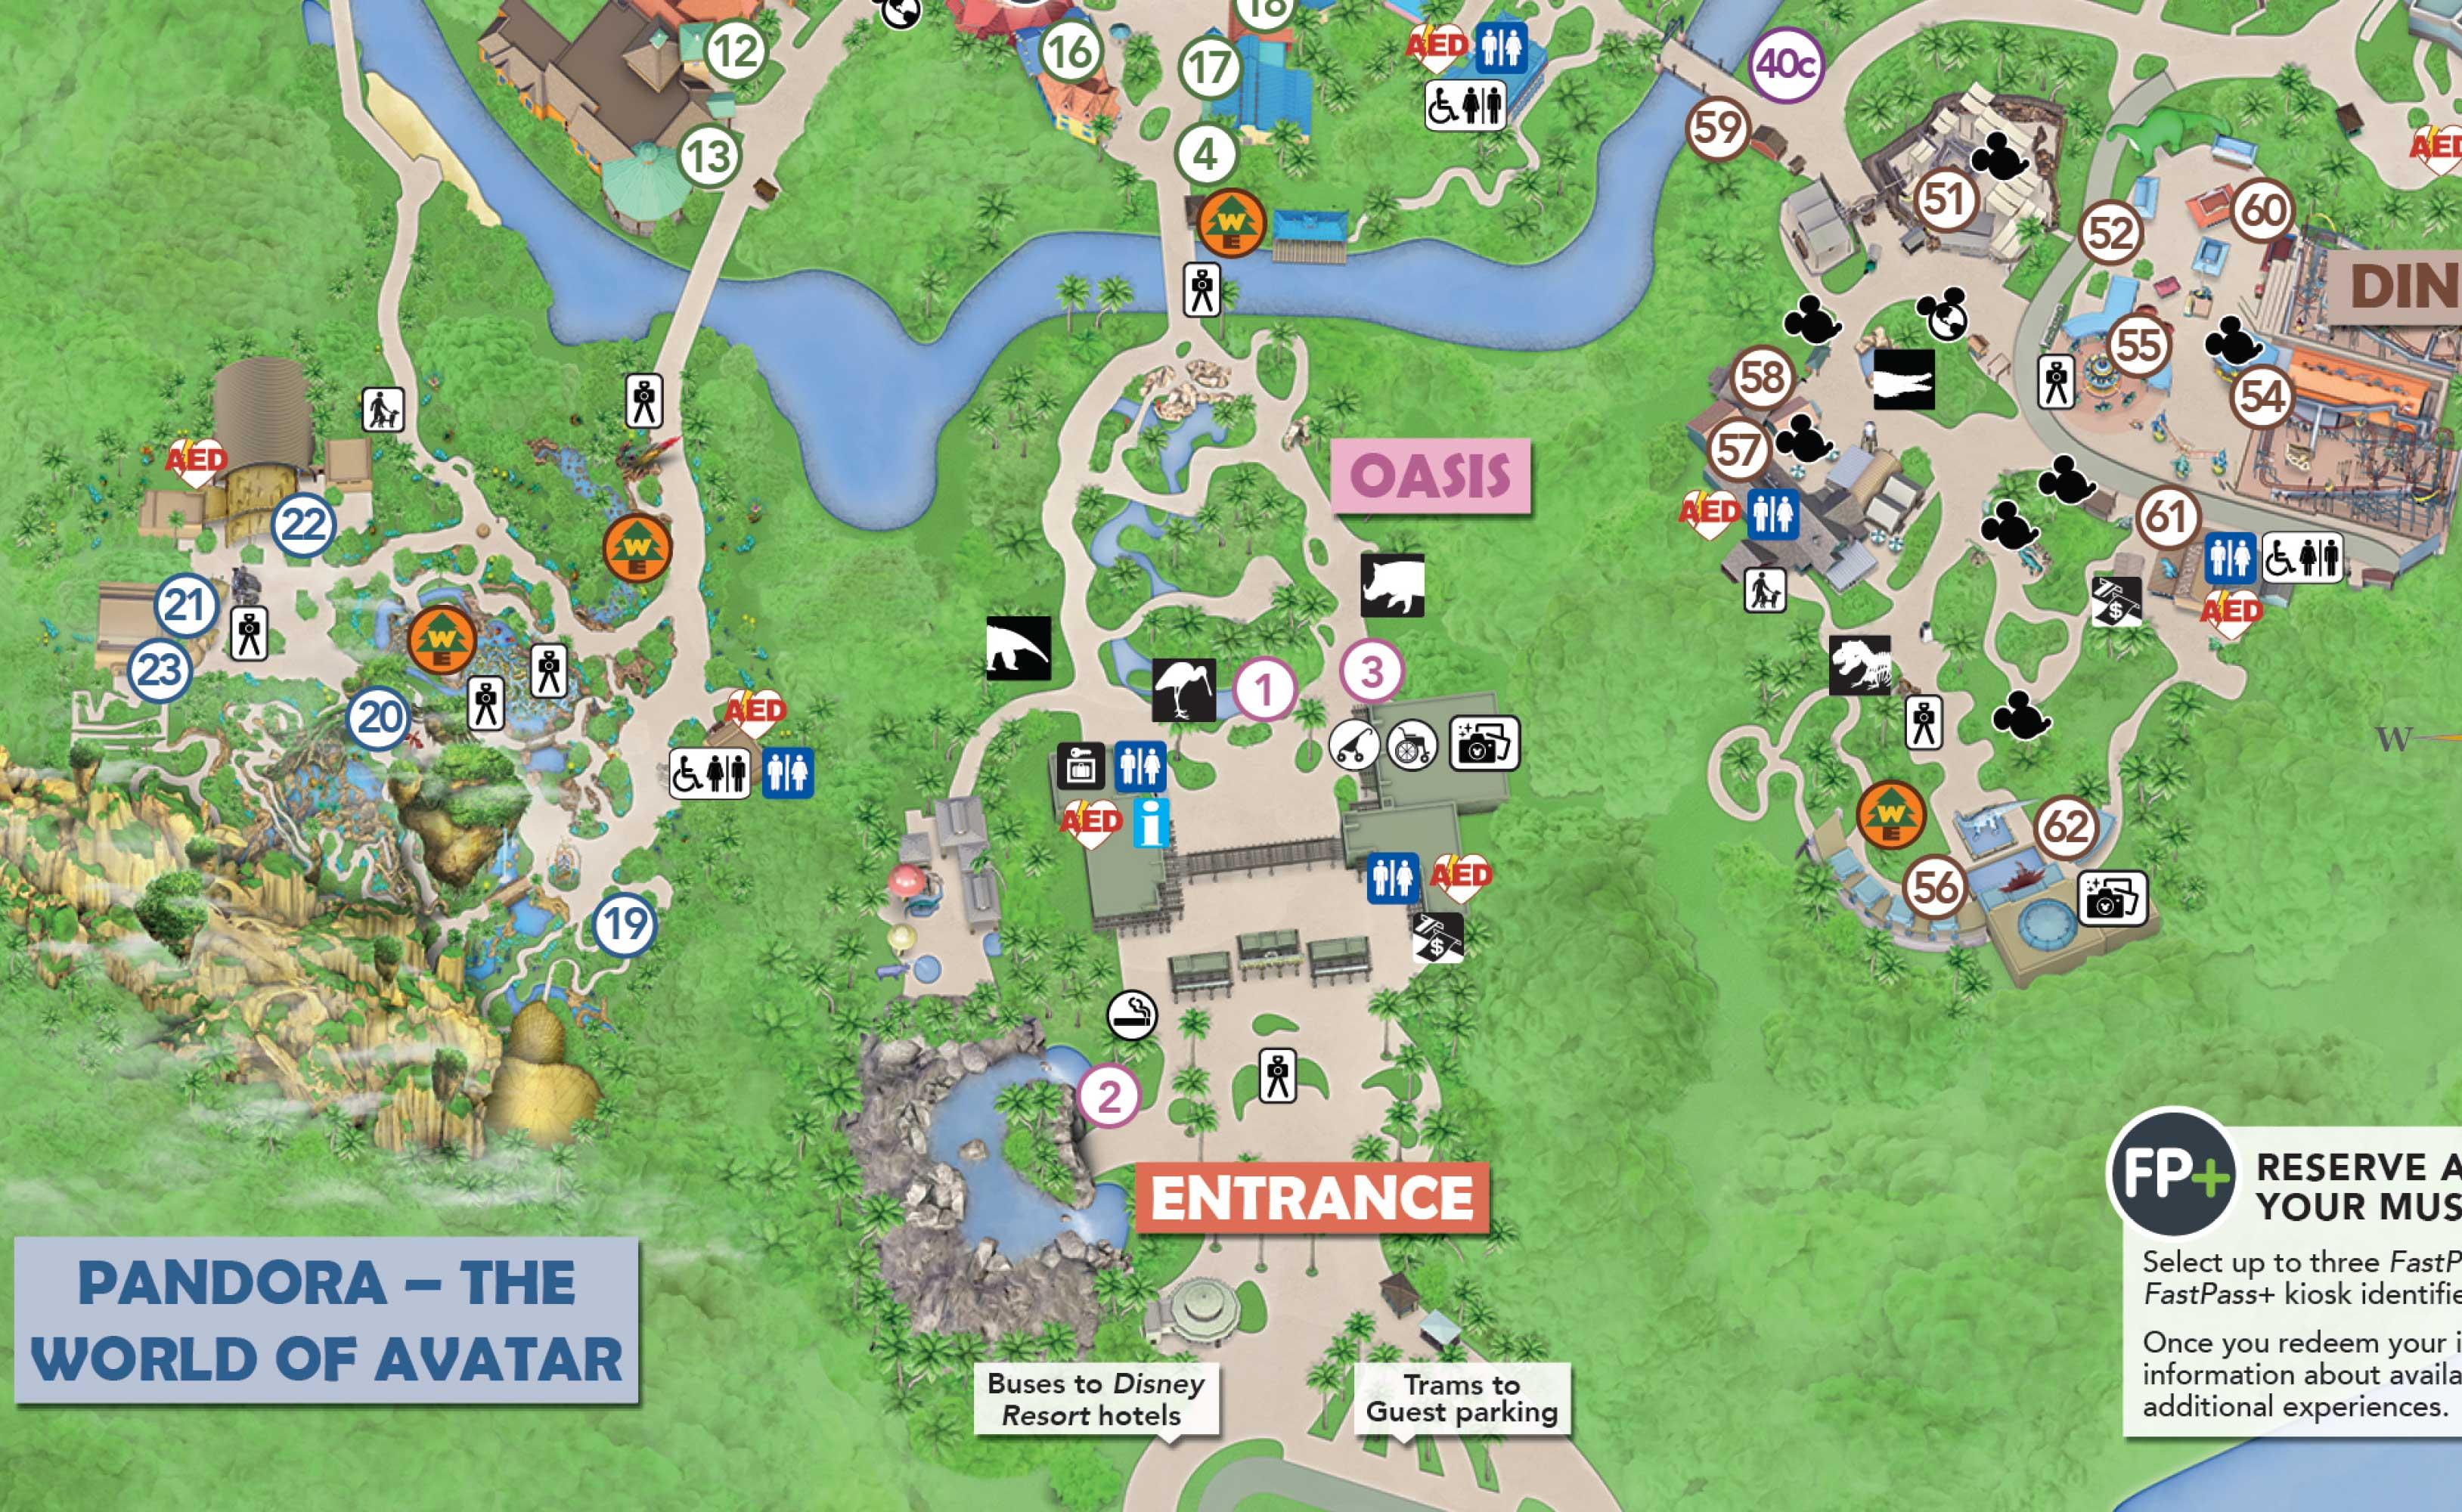 Walt Disney World theme park smoking locations - May 1 2019 - Photo